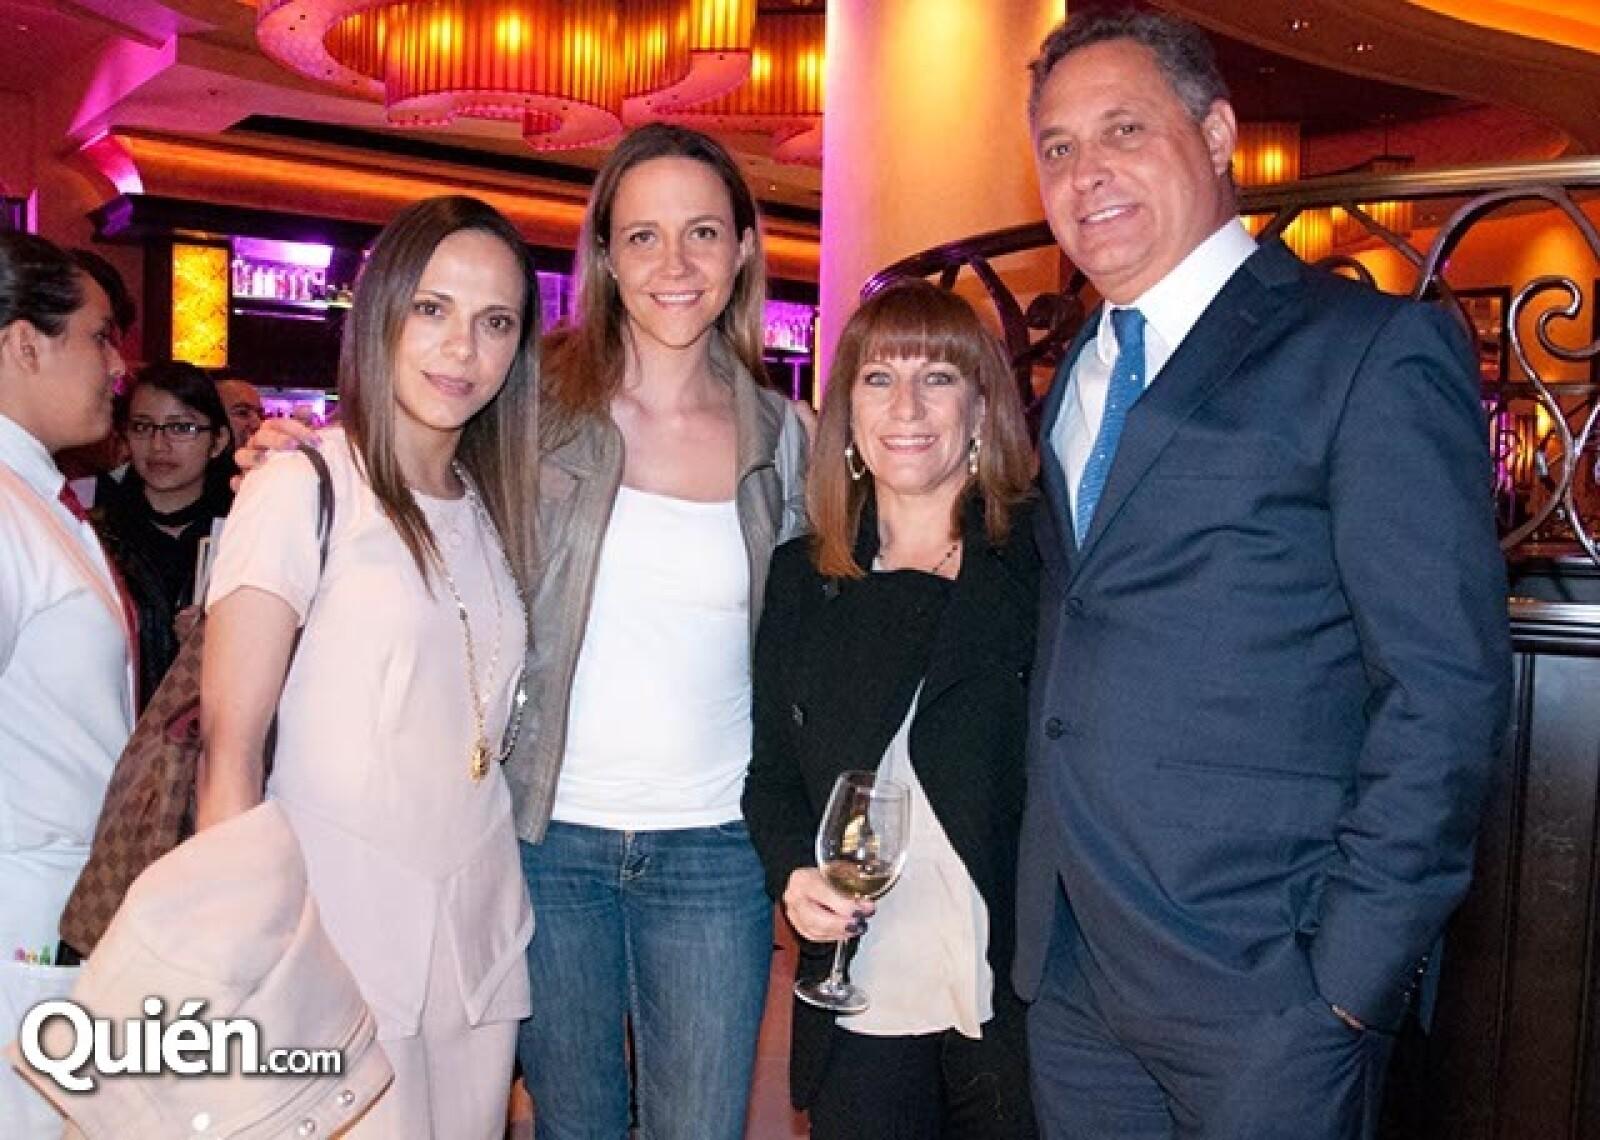 Lorayne Guzmán, Alejandra Rivas, Adriana y Federico Tejado